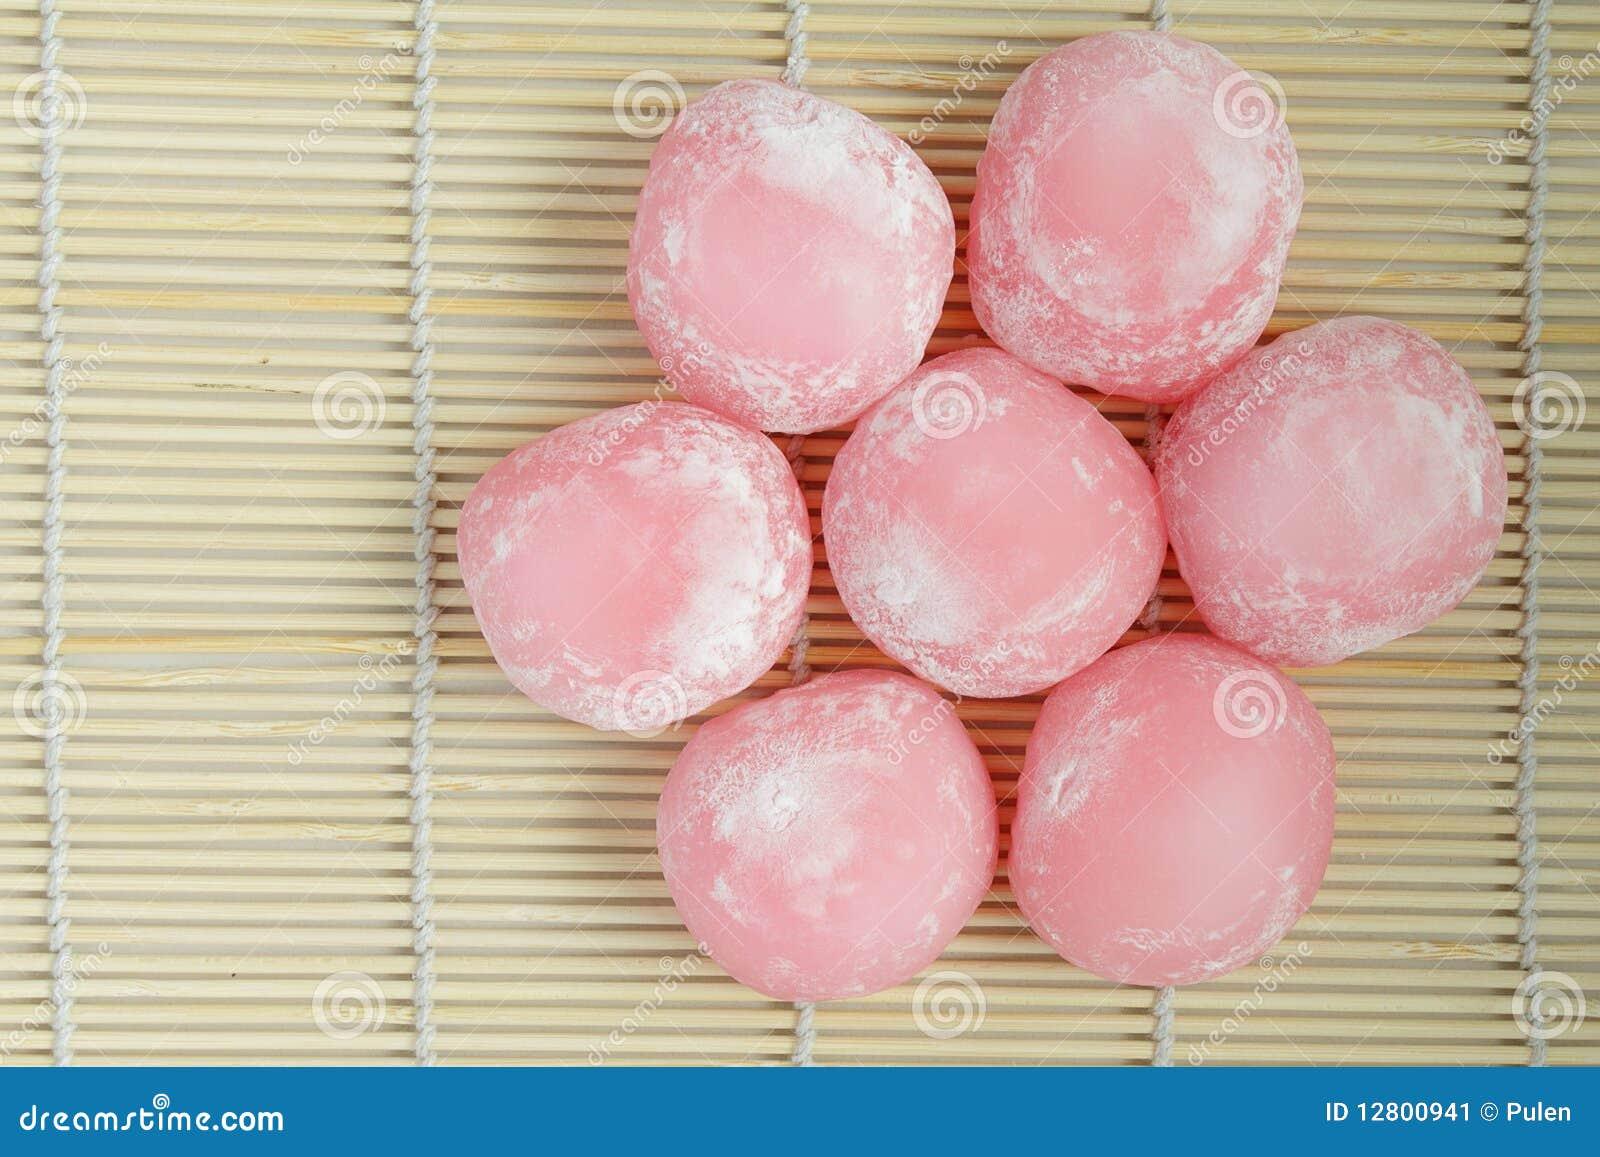 Grupo de bolos de arroz japoneses cor-de-rosa